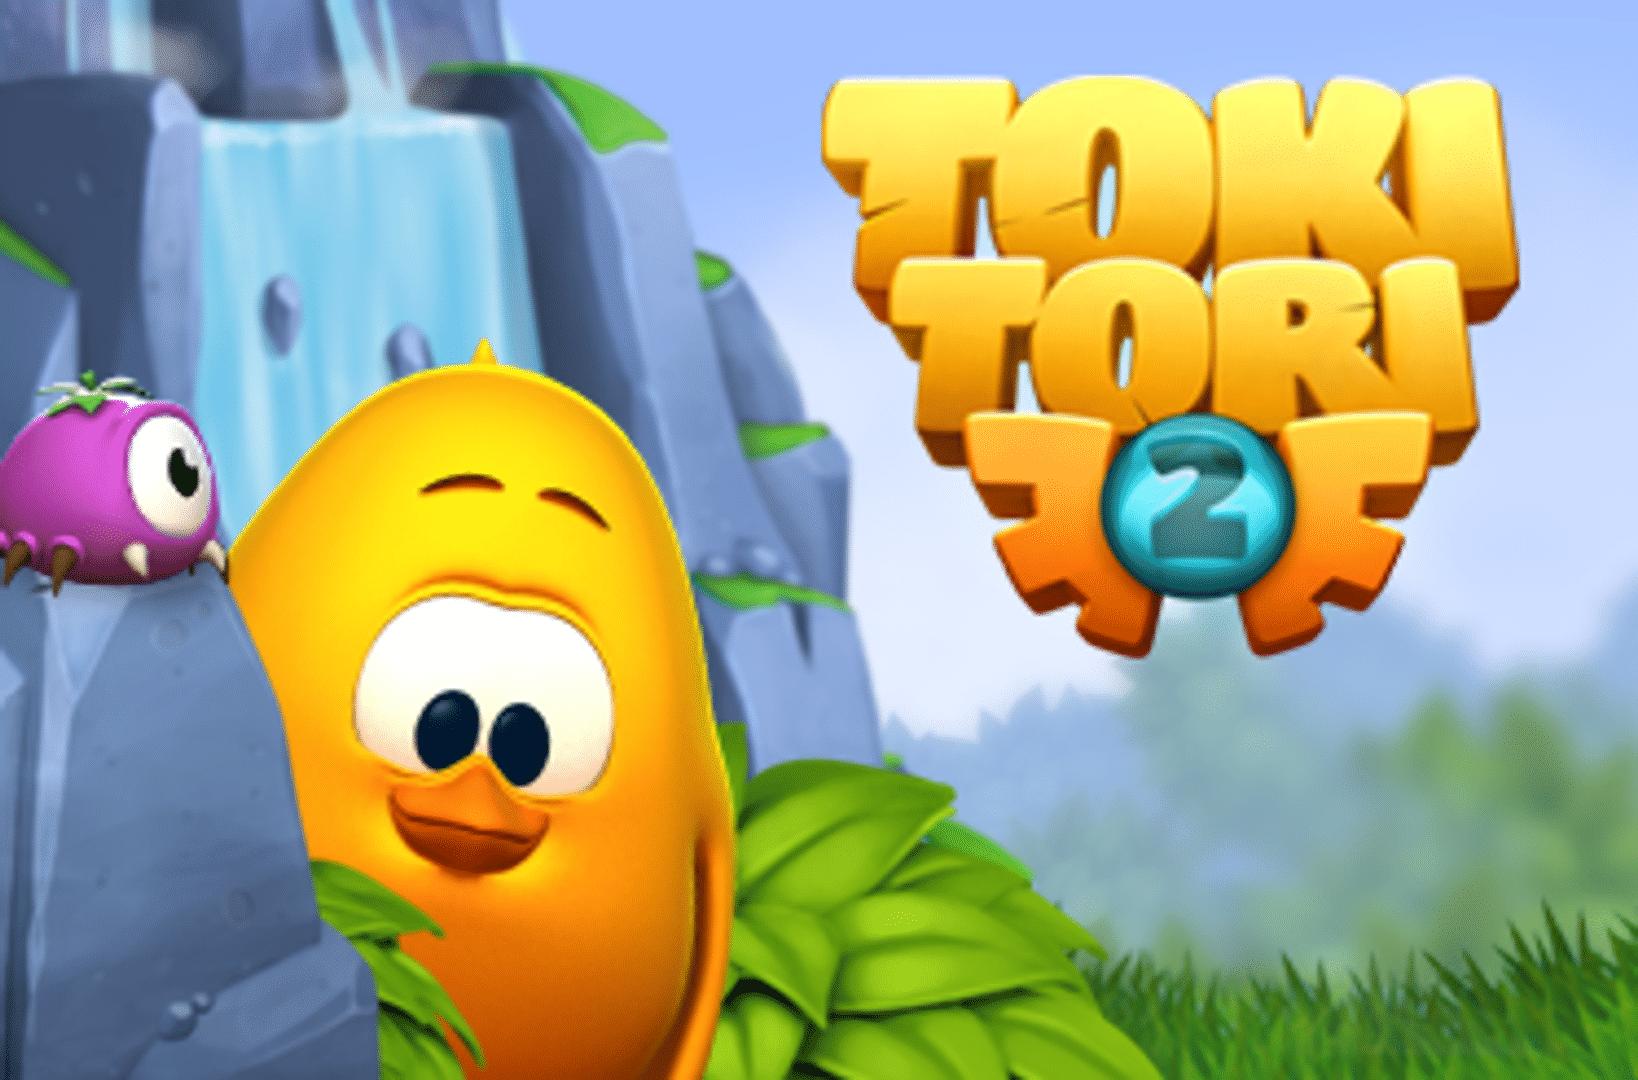 buy Toki Tori 2 cd key for pc platform